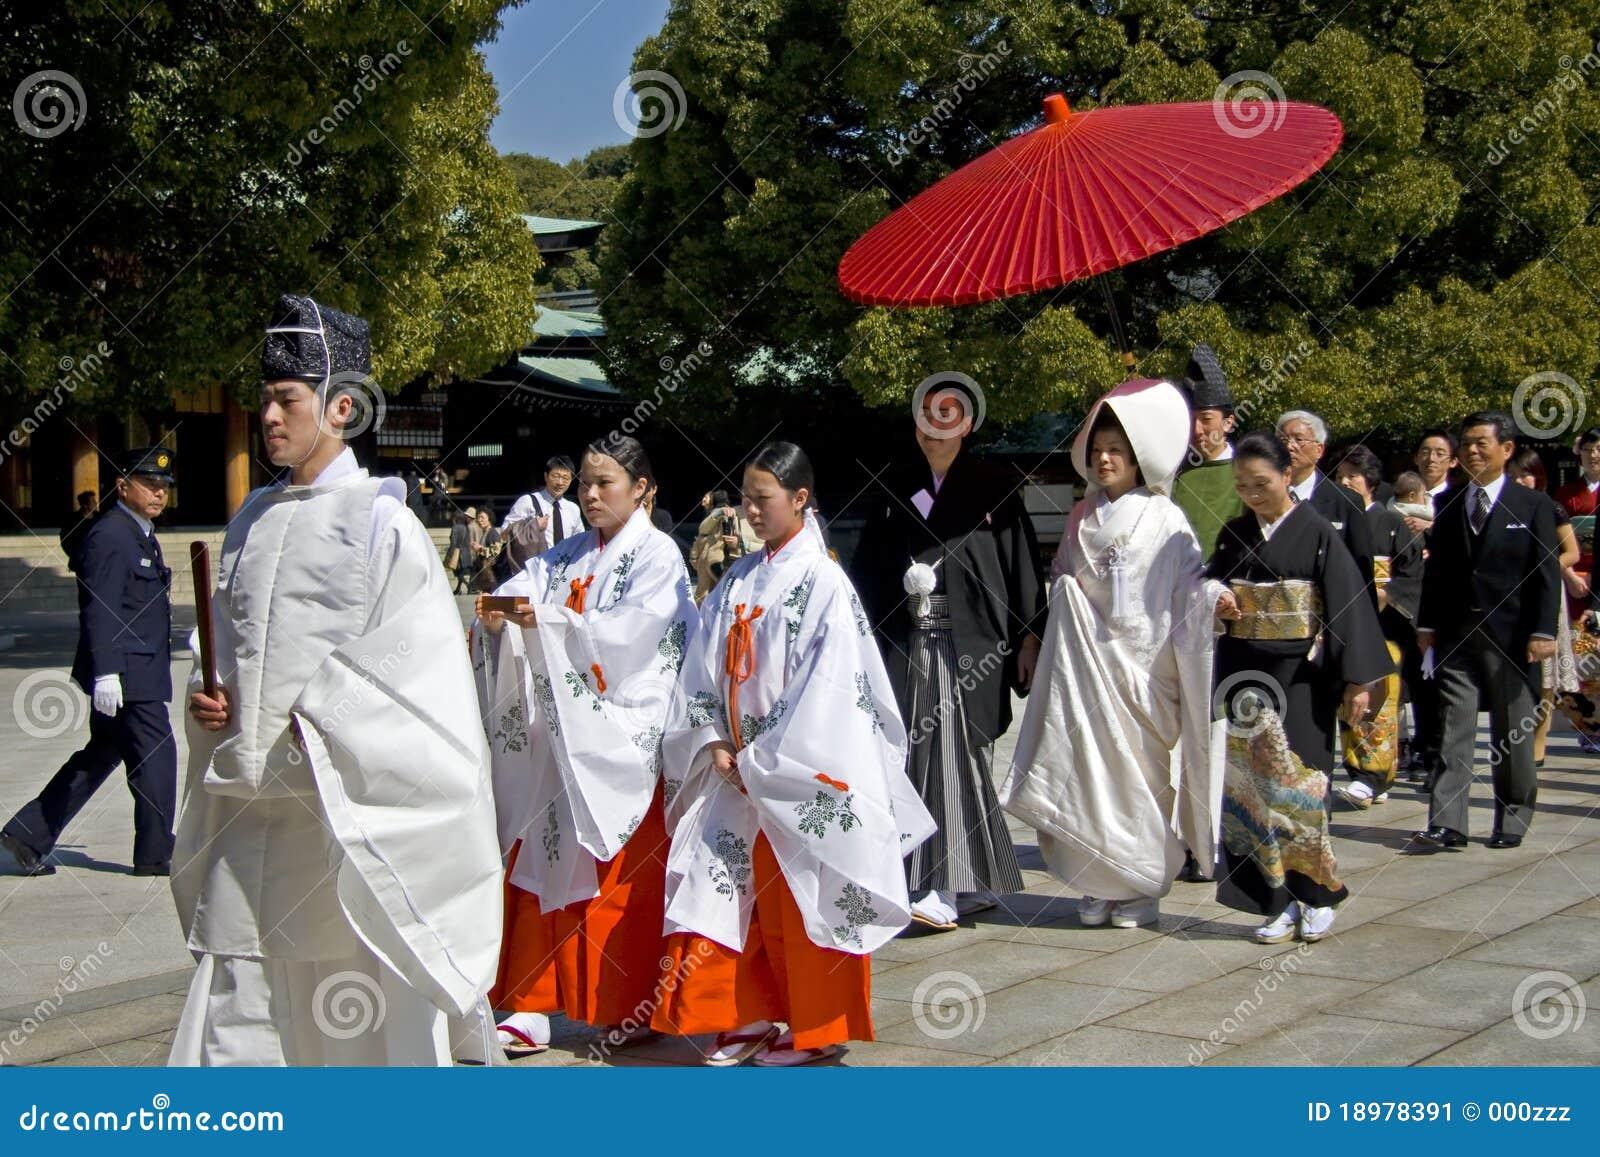 Japanese Wedding Traditions.Japanese Shinto Wedding Ceremony Editorial Photo Image Of